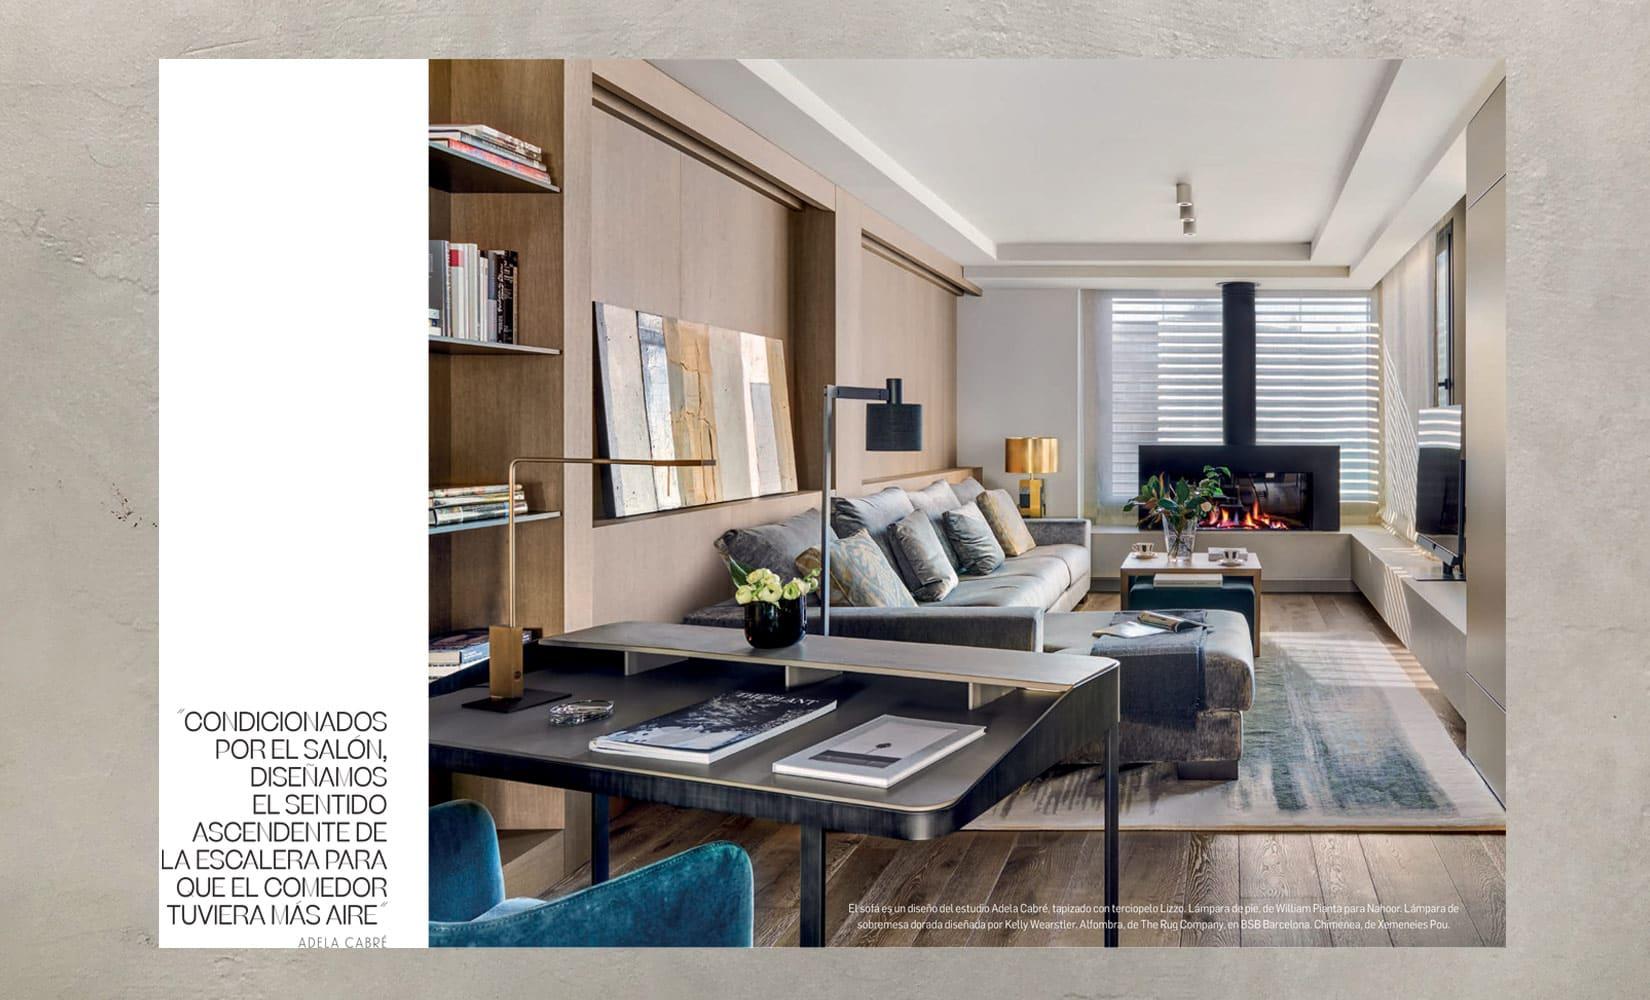 https://www.adelacabre.com/wp-content/uploads/2020/12/arquitectura-y-diseno-junio-2019-02.jpg